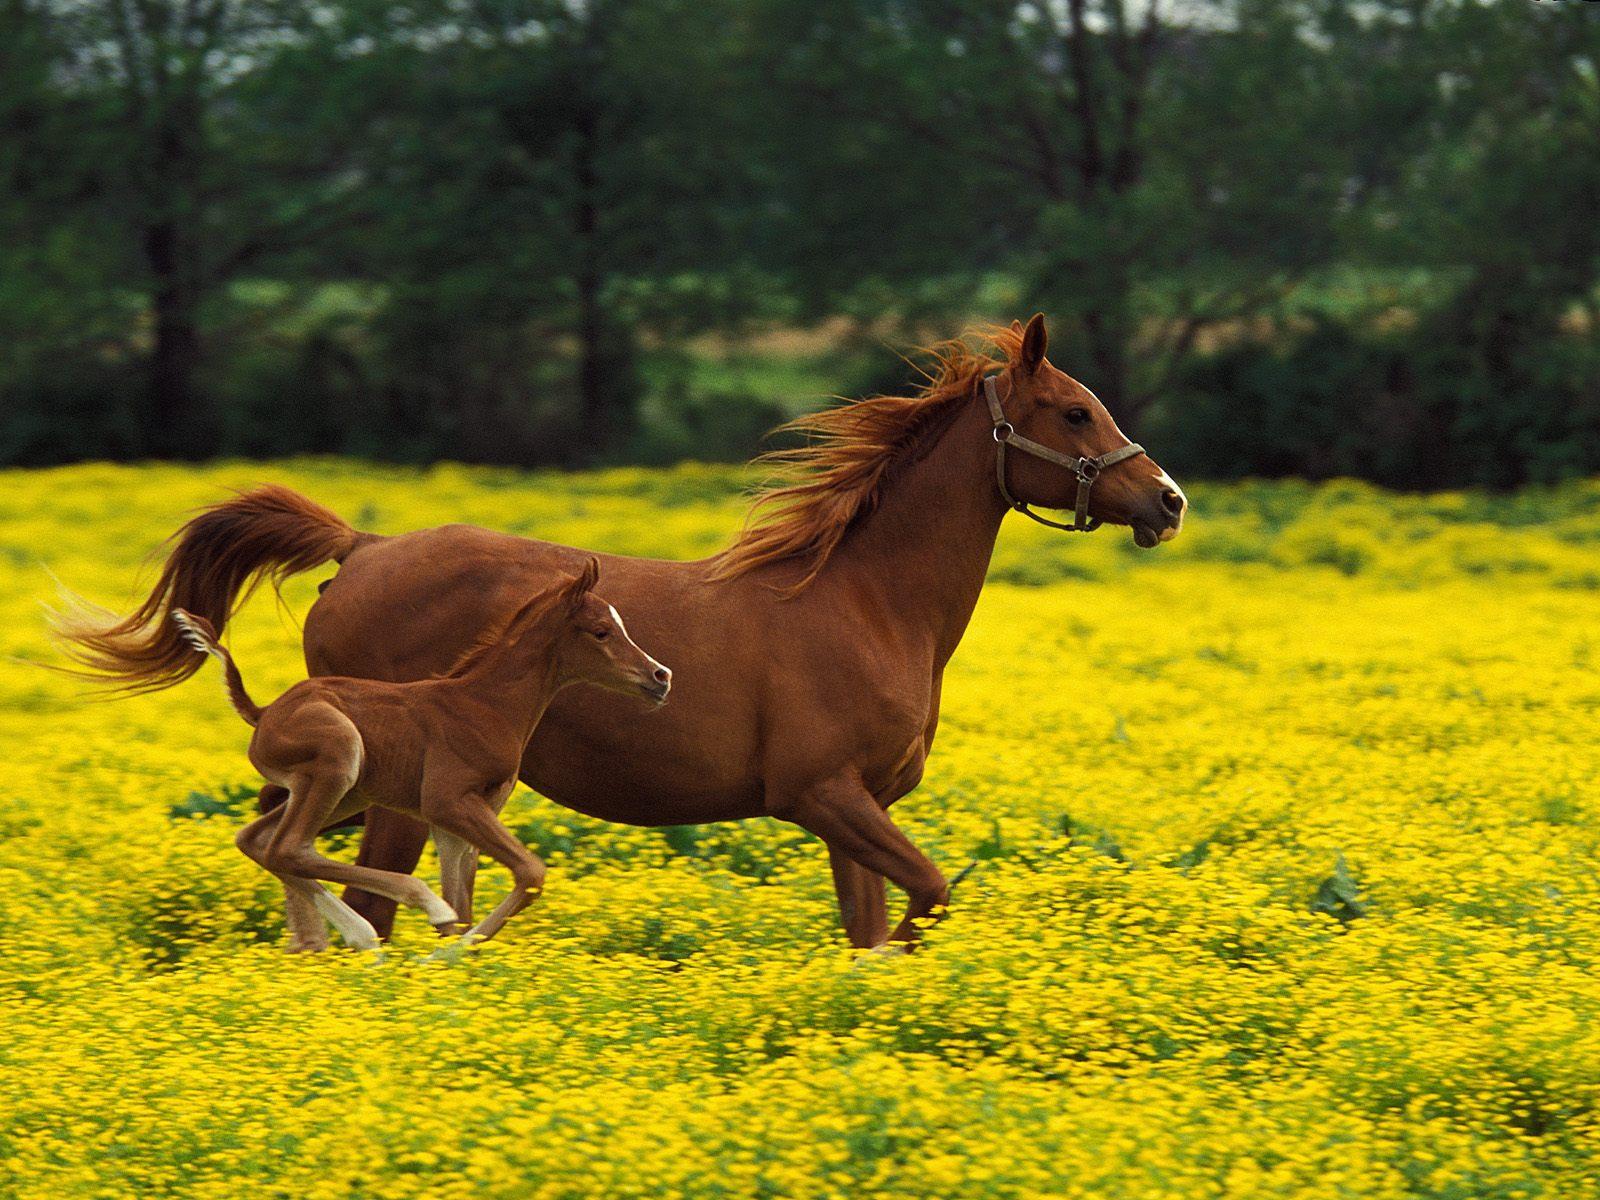 Horse WallpapersHD Horses Wallpapers Beautiful Cool Wallpapers 1600x1200